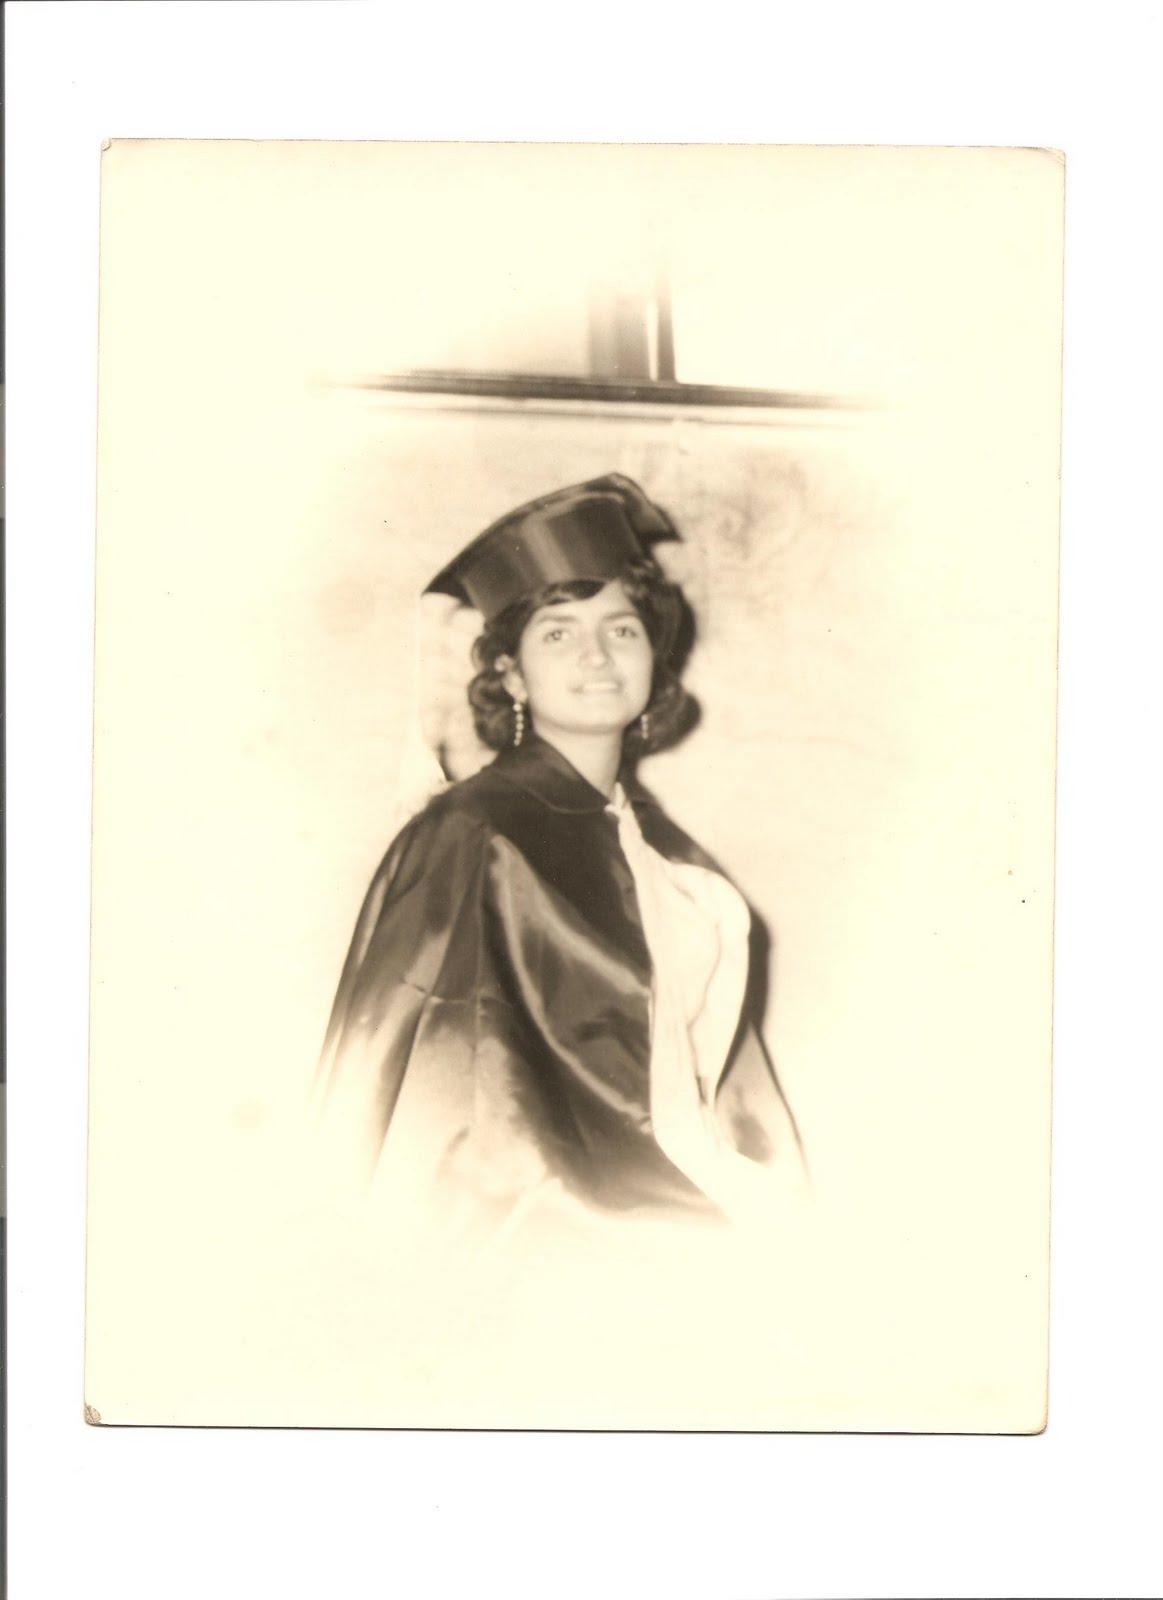 http://1.bp.blogspot.com/_14xGDVykK6Q/TClA_1ge15I/AAAAAAAAAKs/8heSo8dvmro/s1600/Nena+On+Graduation+day.jpg